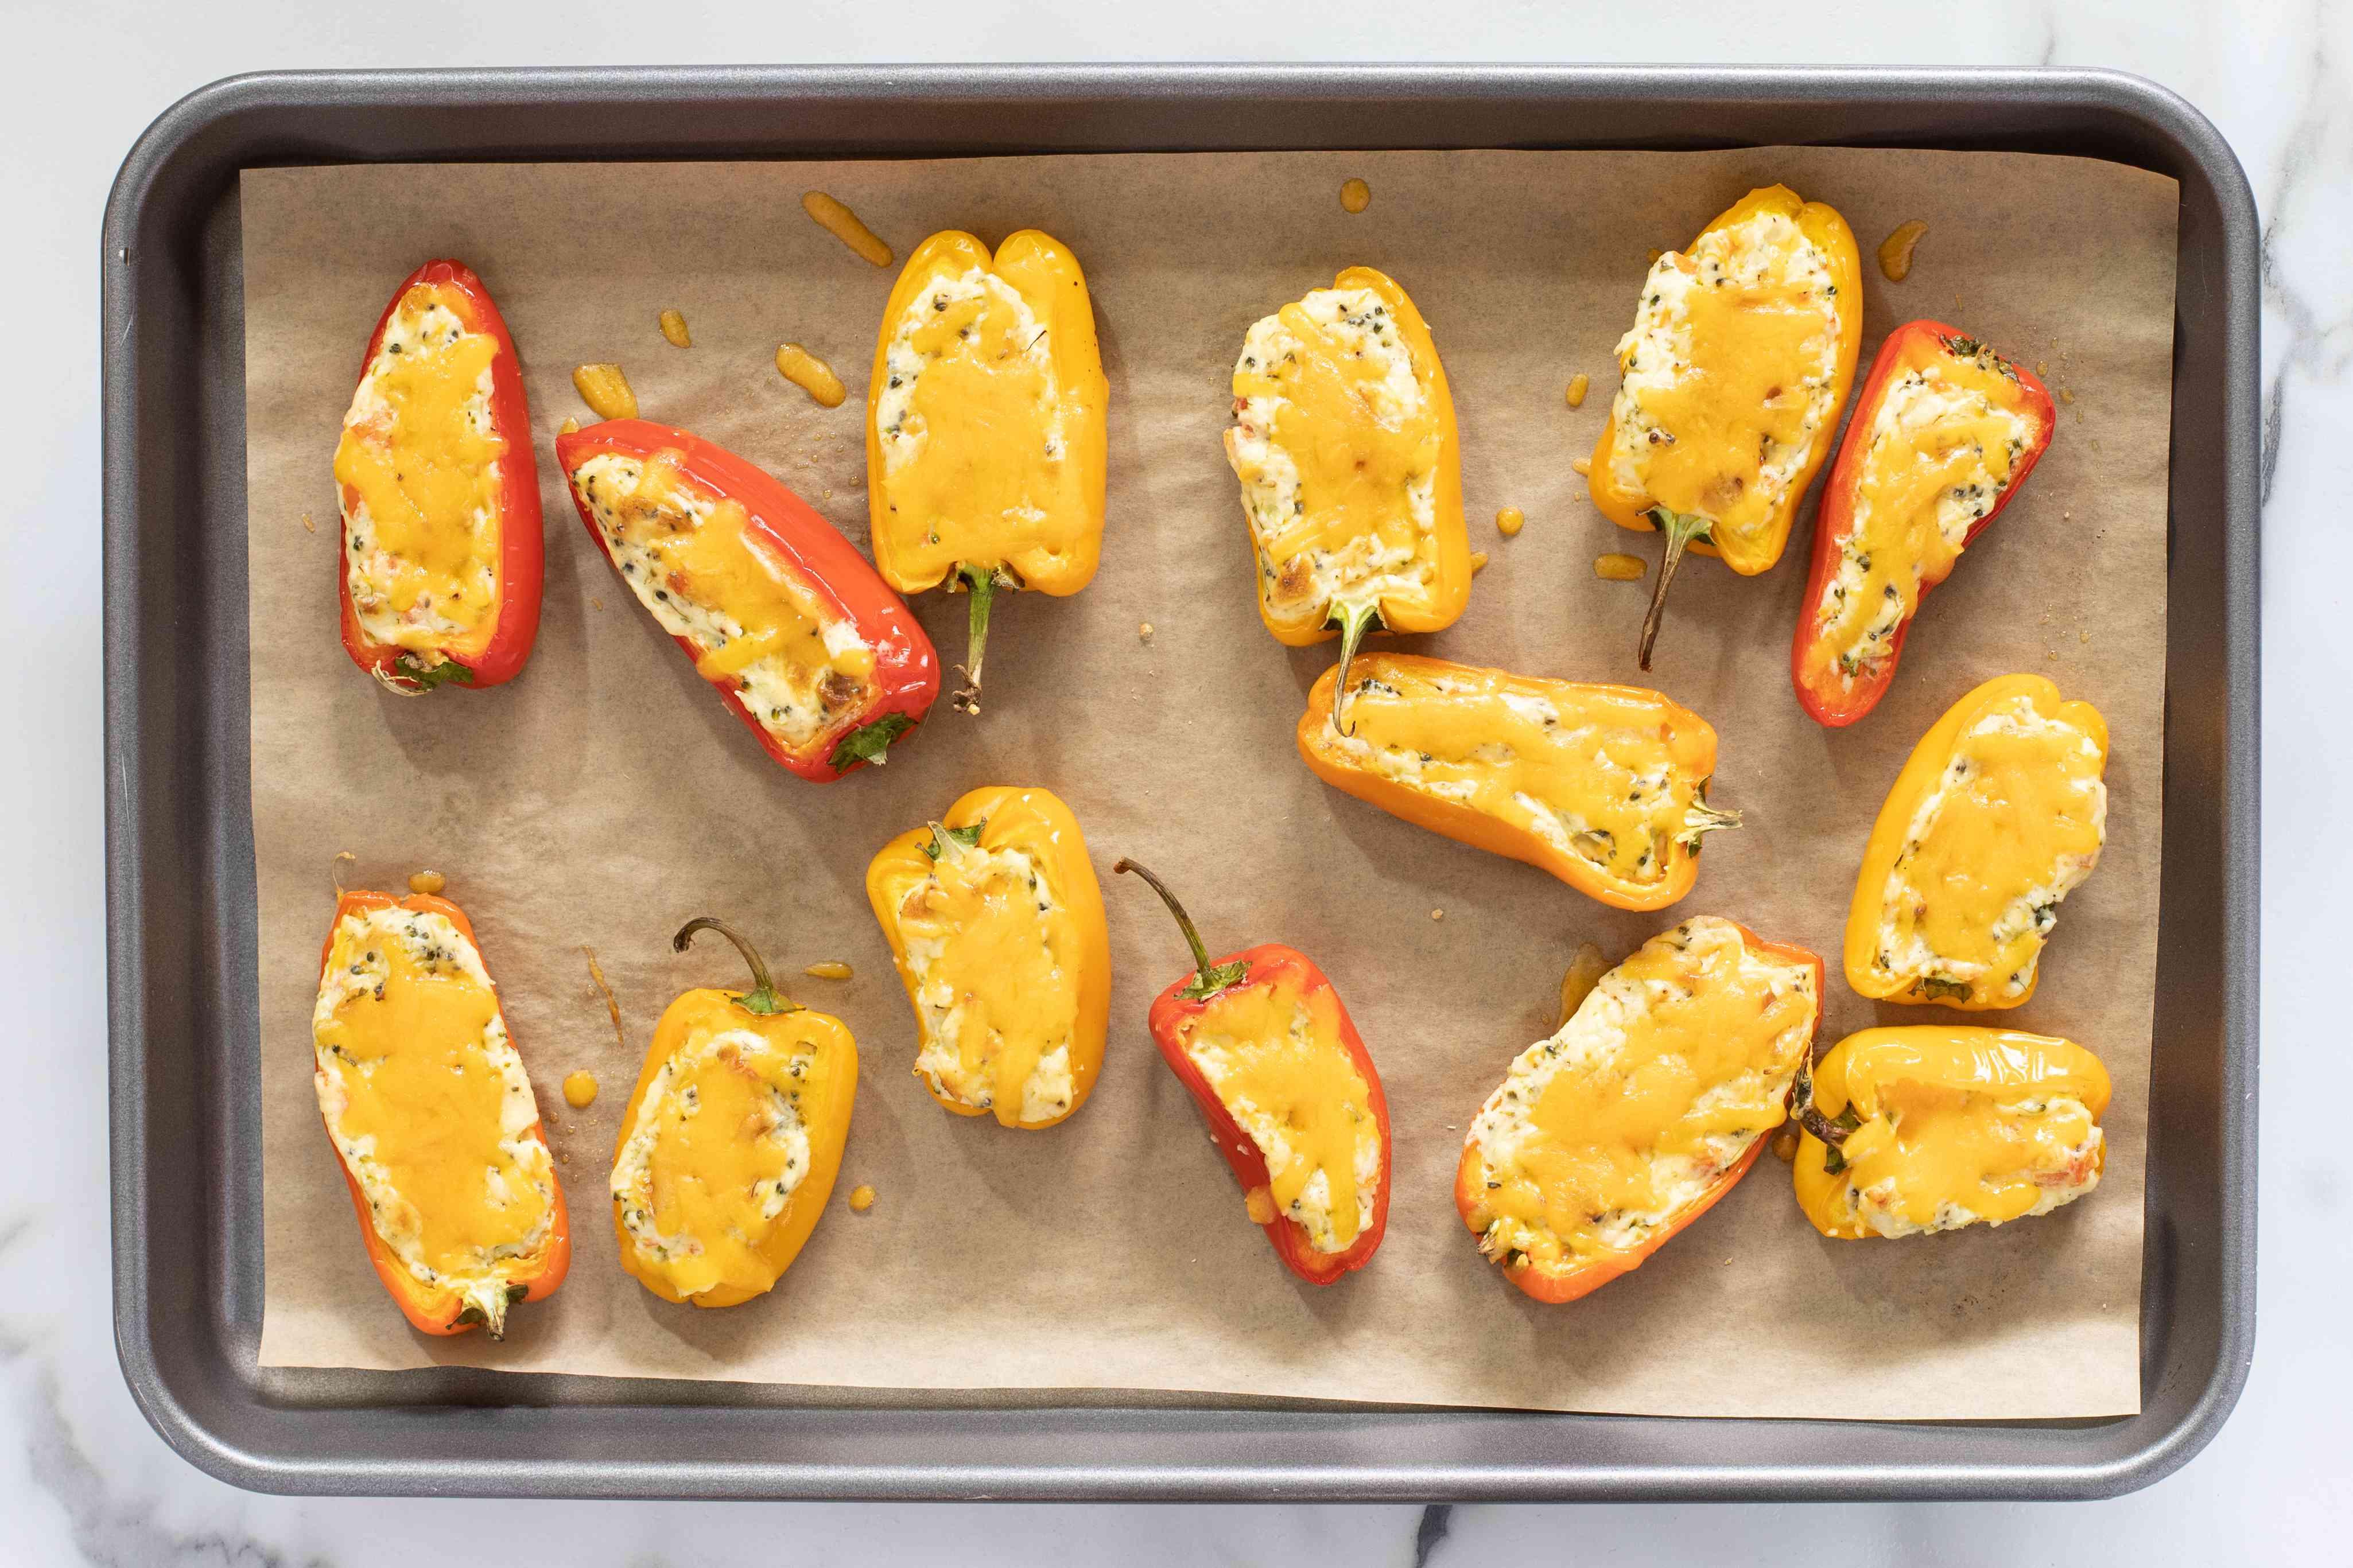 stuffed mini peppers on baking sheet